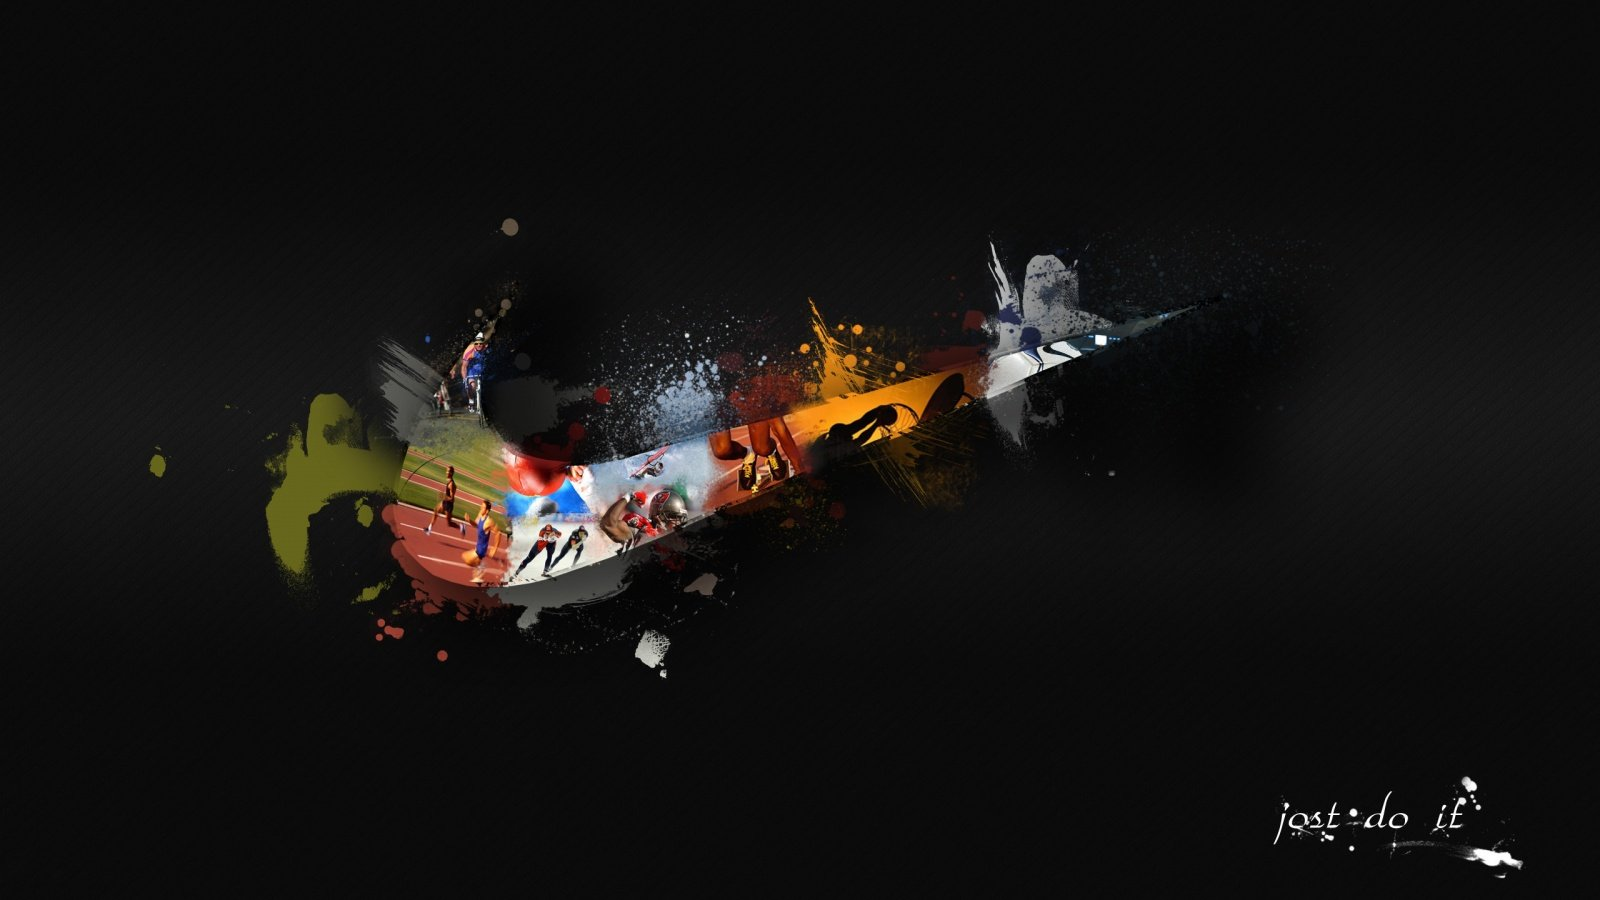 Nike Computer Wallpapers Desktop Backgrounds 1600x900 ID333424 1600x900